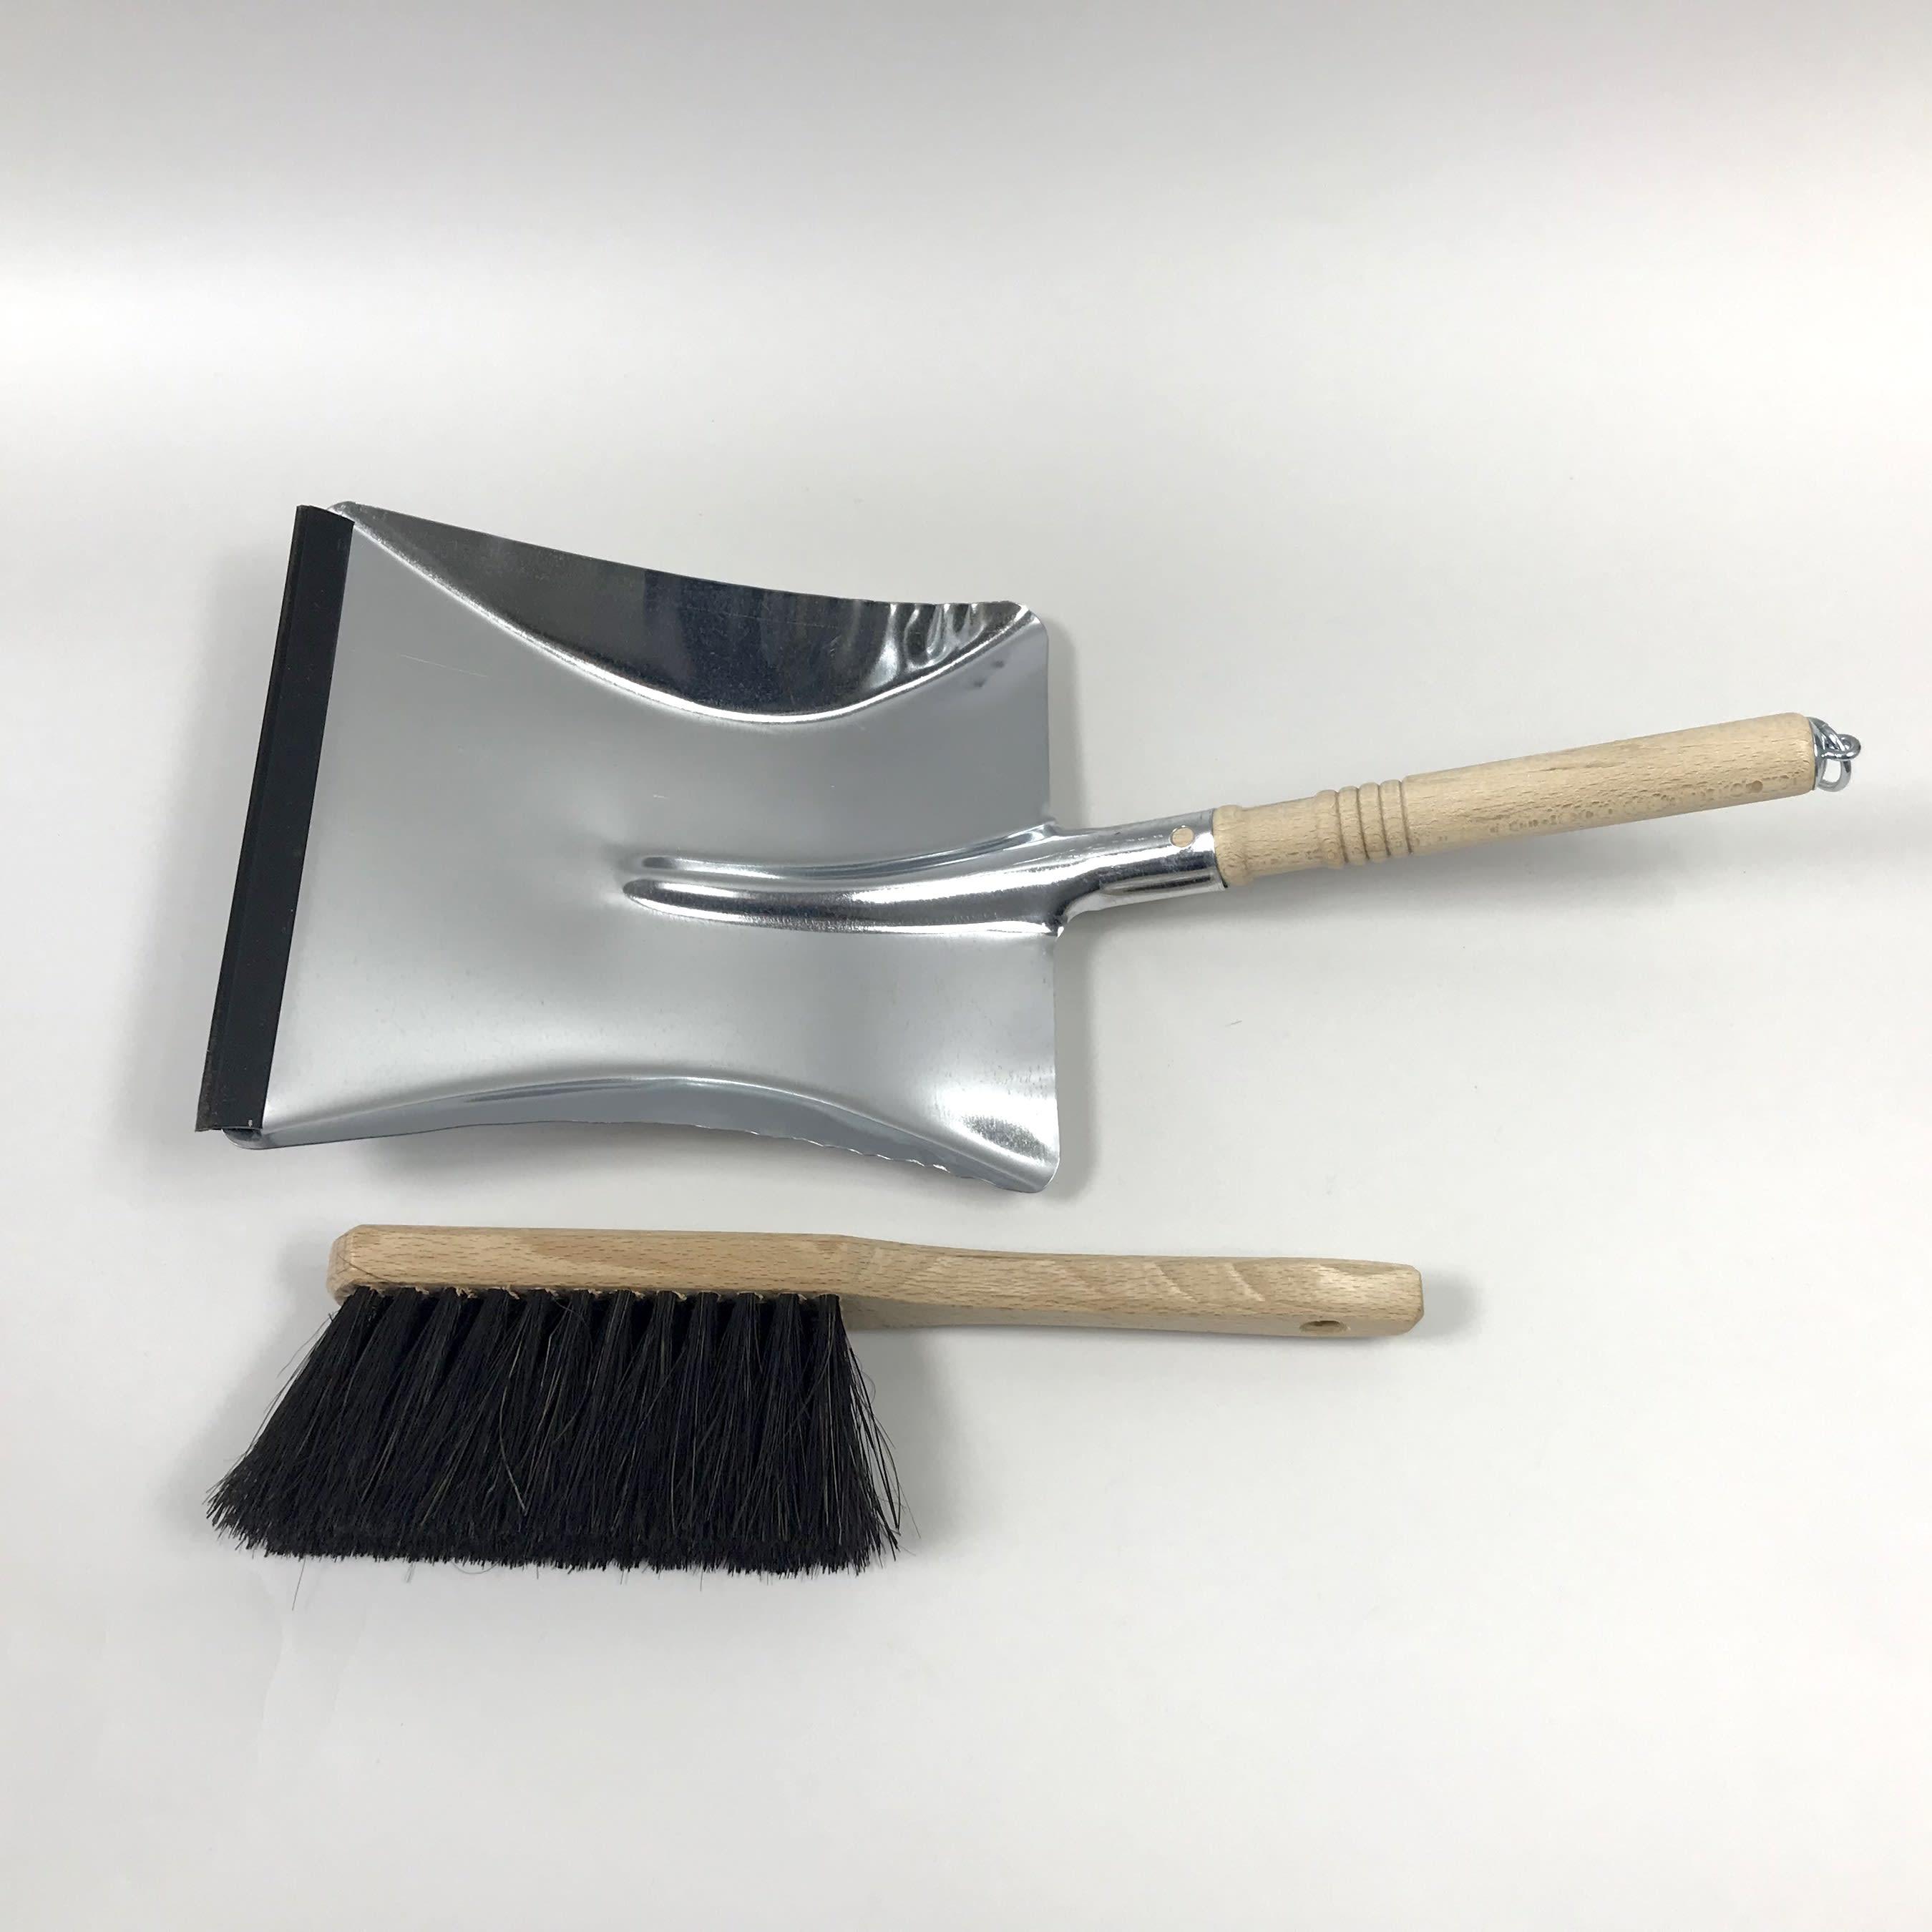 Redecker Dustpan and Brush